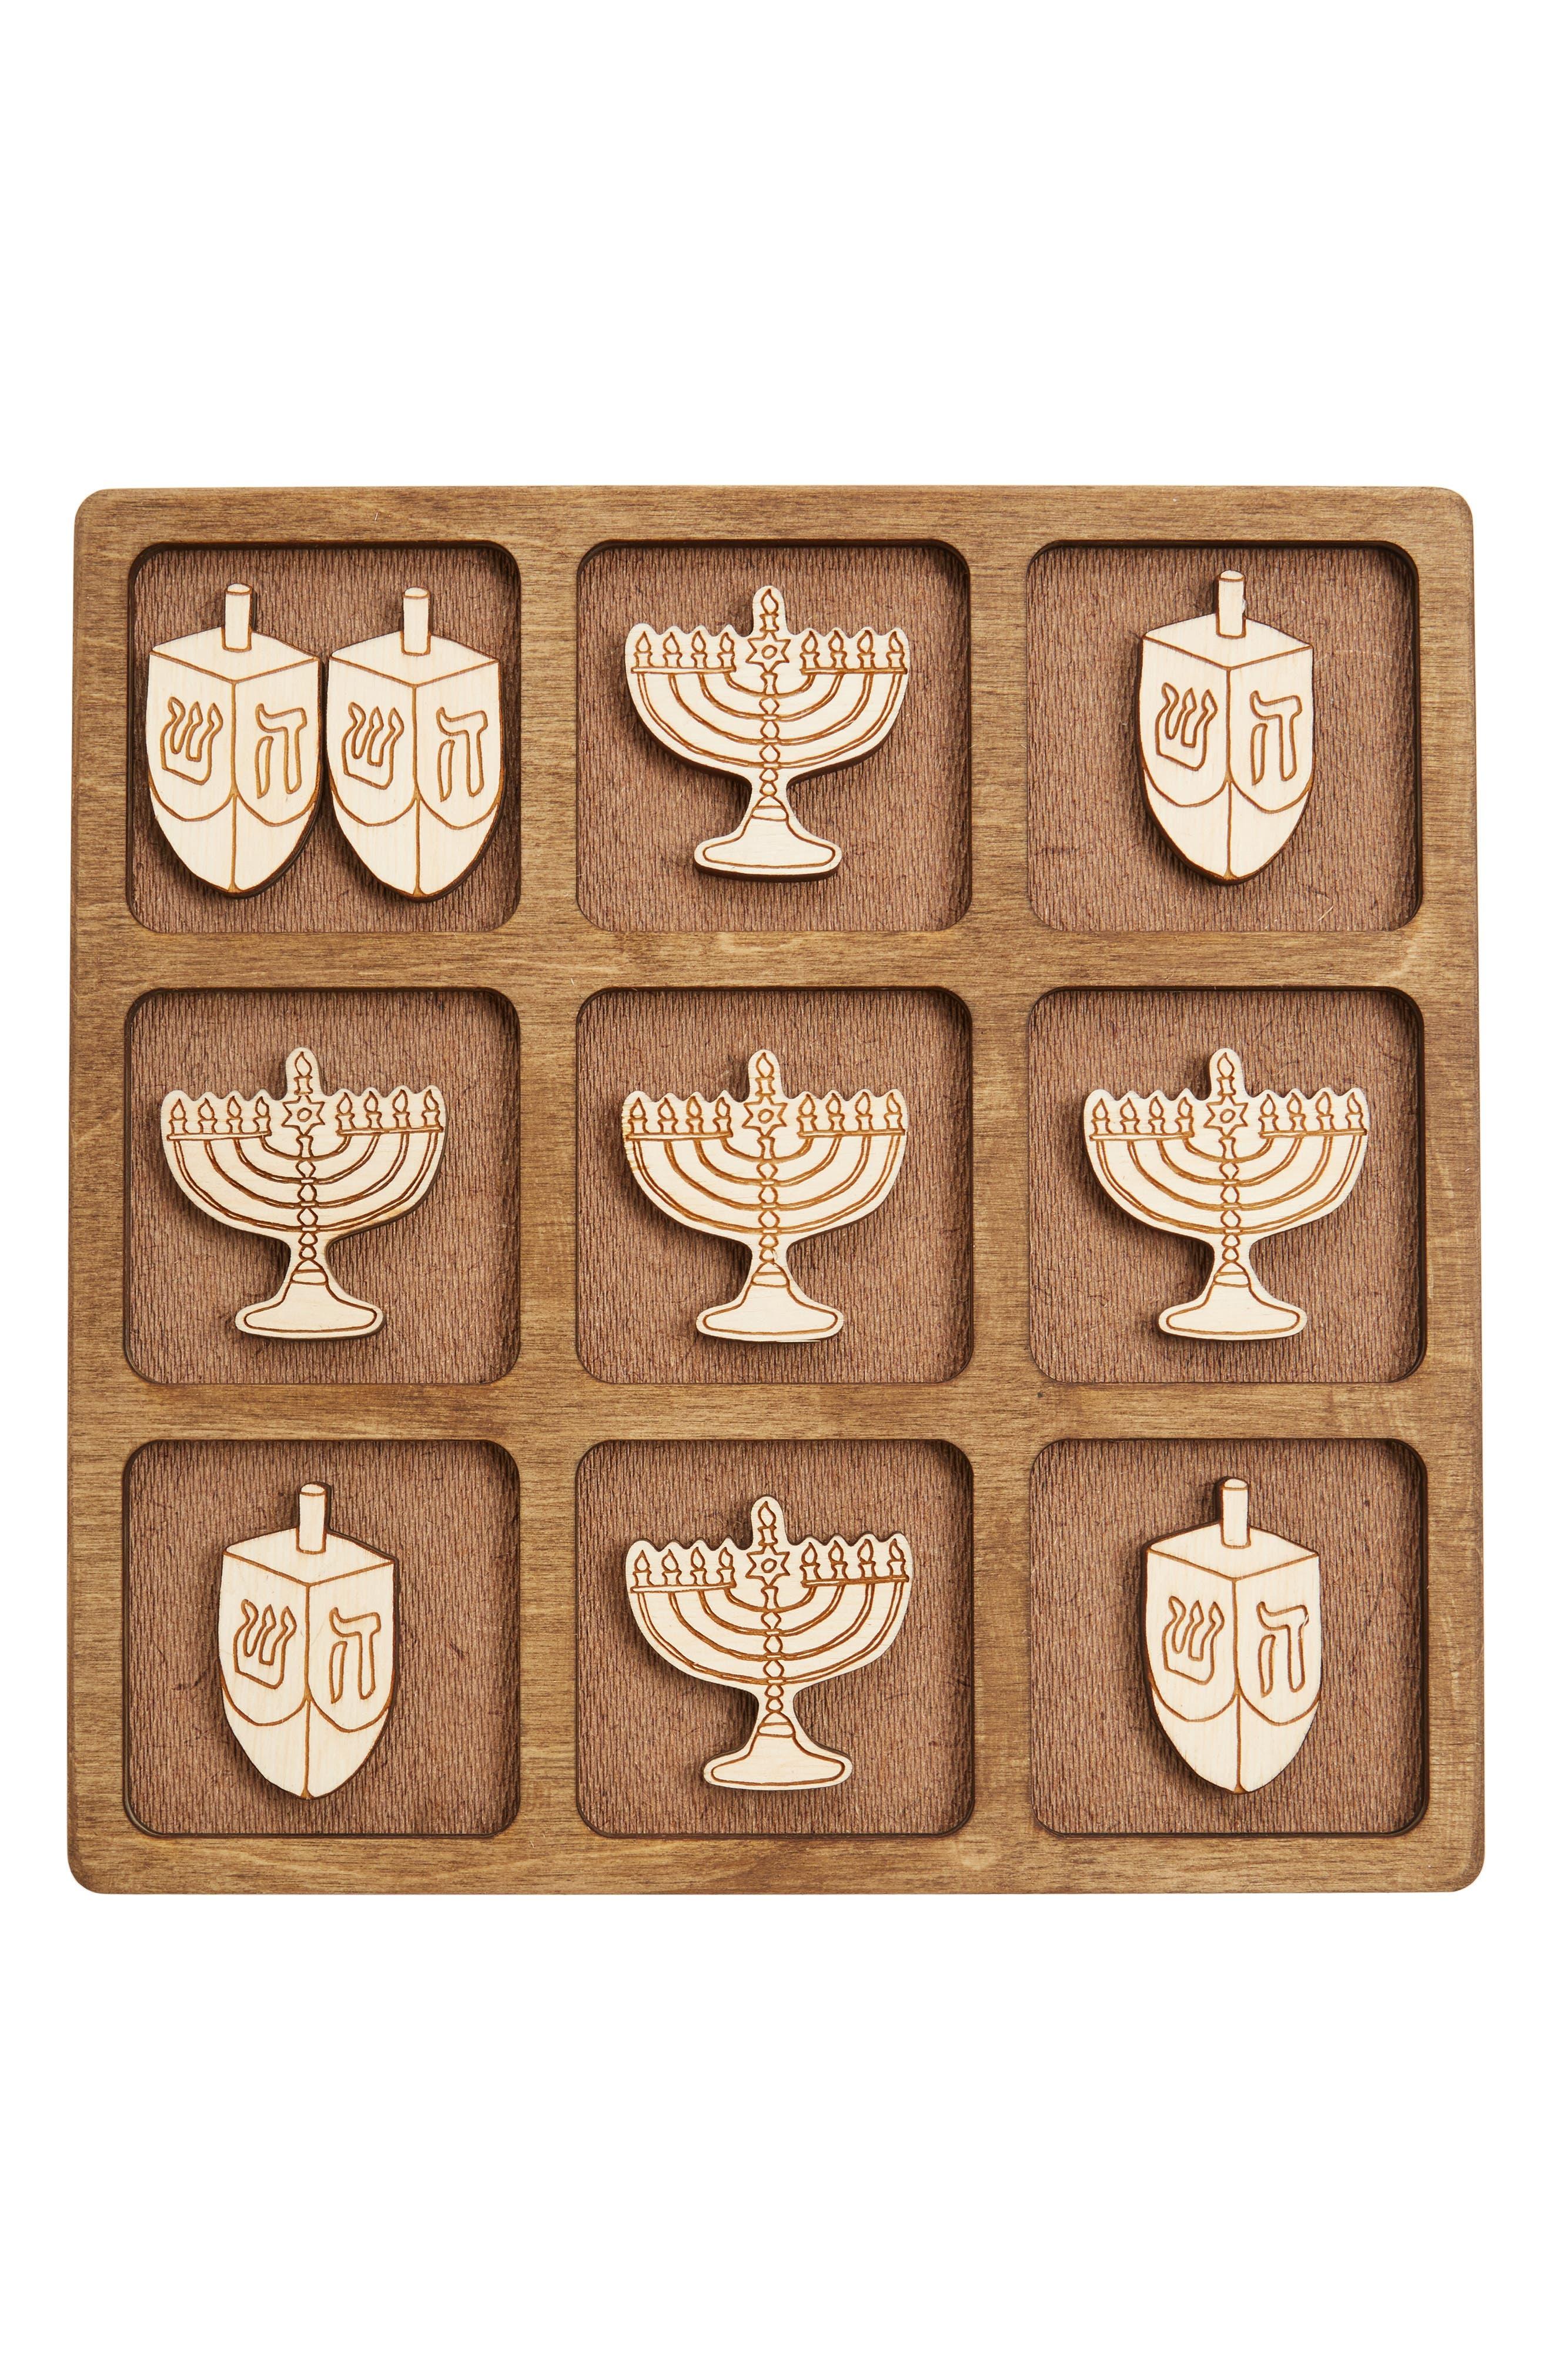 This & That Etc. Toys 11-Piece Hanukkah Tic-Tac-Toe Game